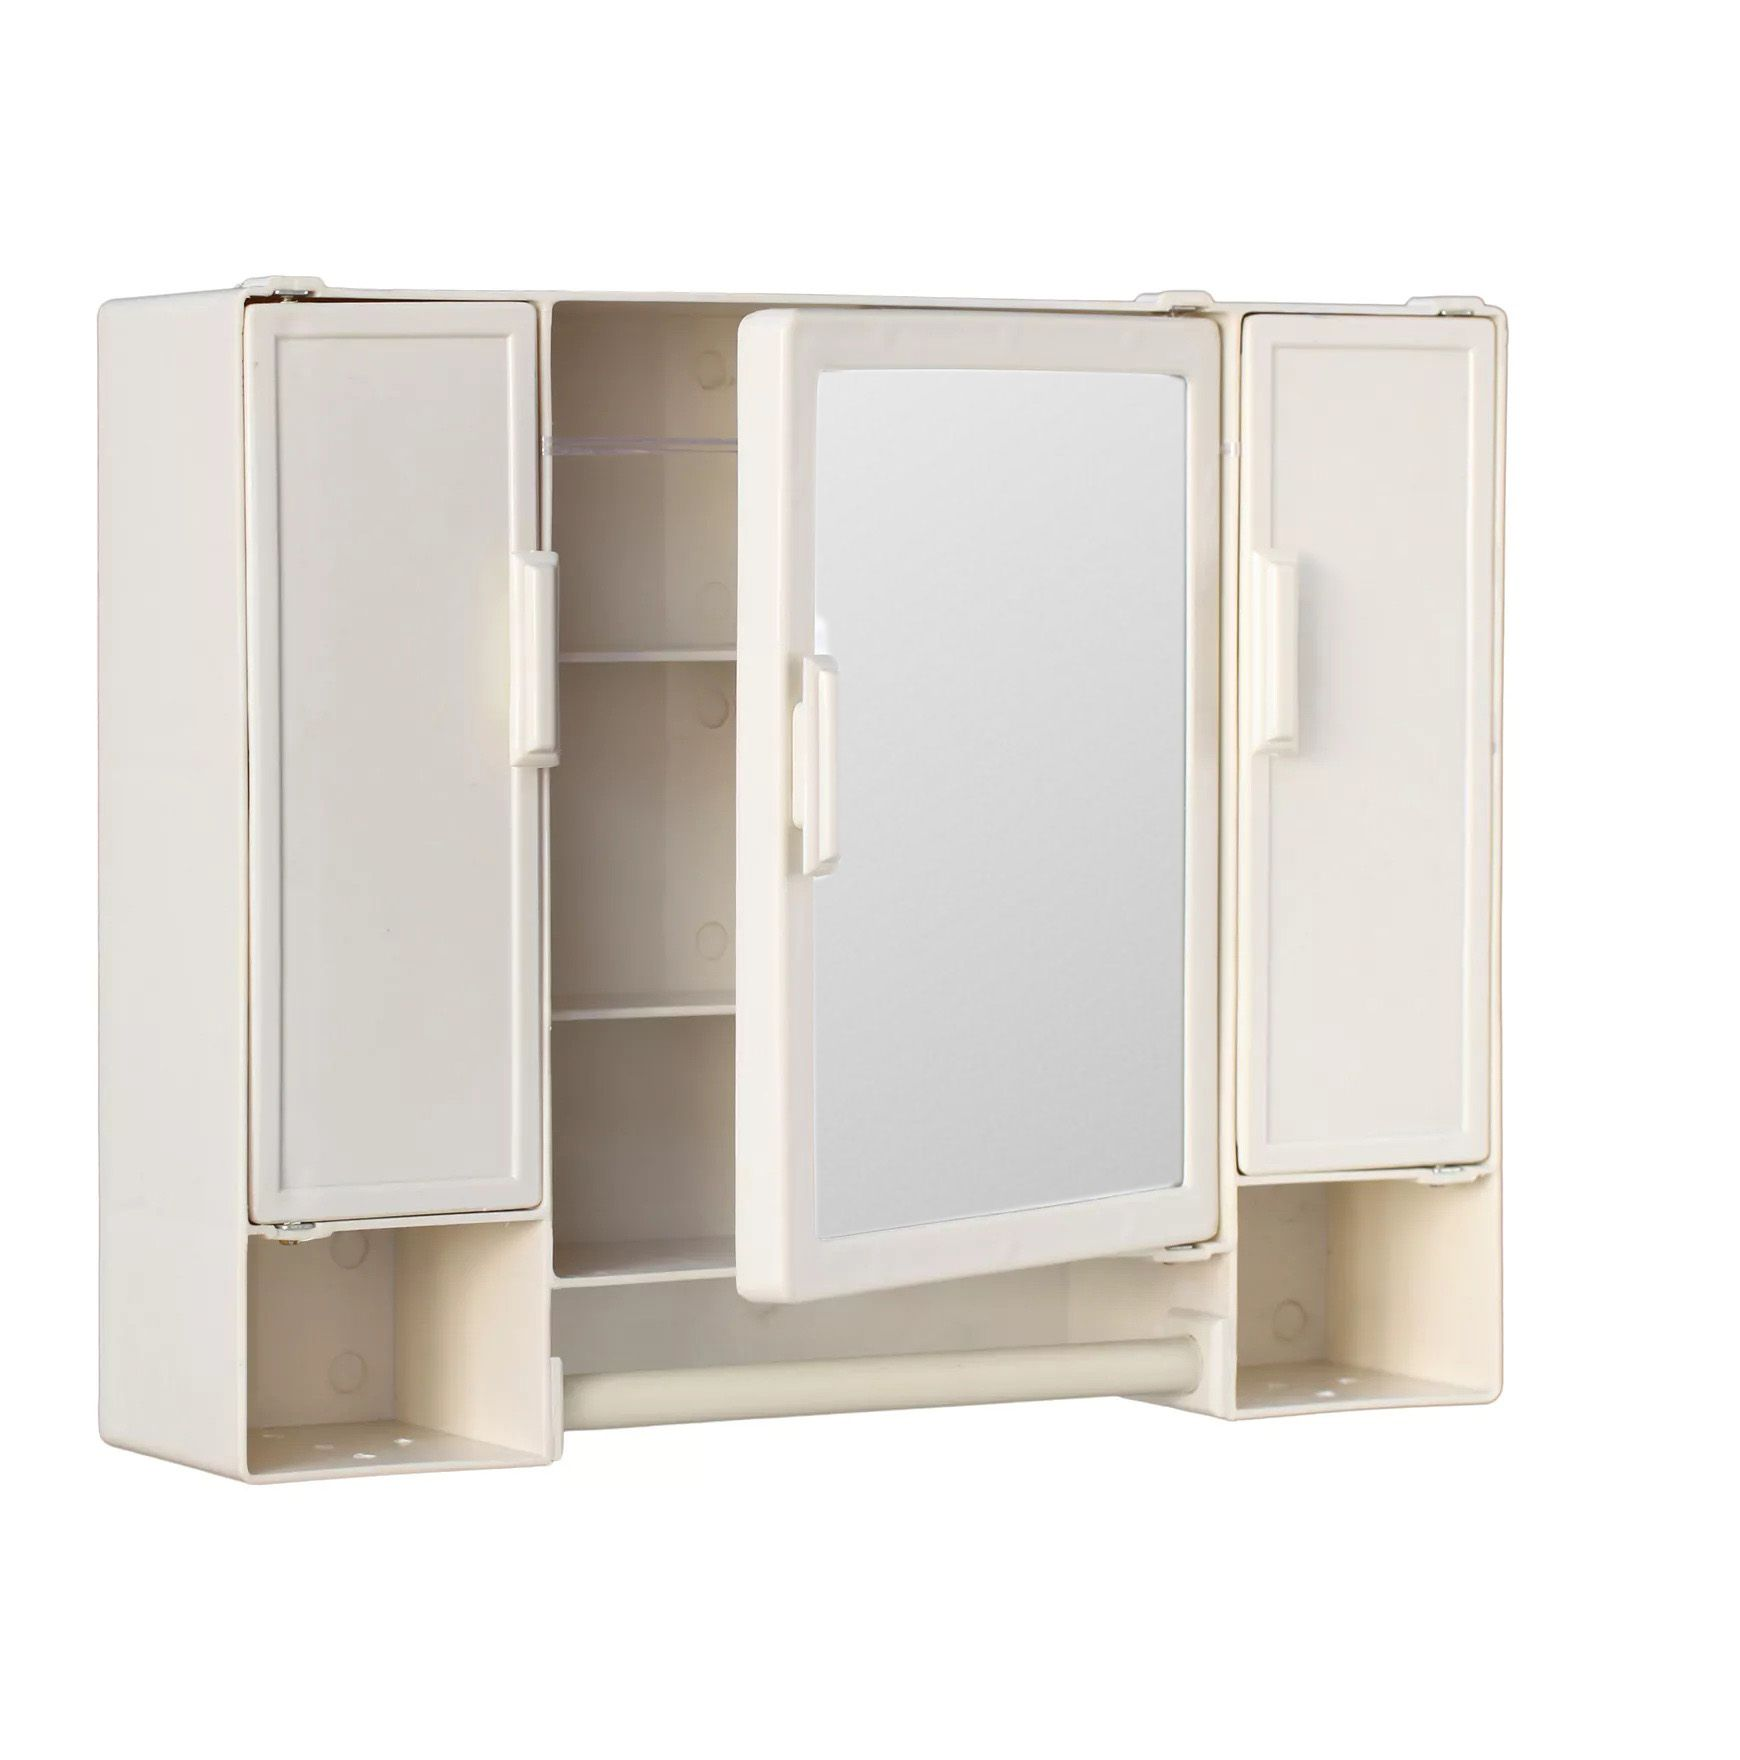 Buy Zahab Pulse Ivory Three Door Plastic Bathroom Cabinet line at